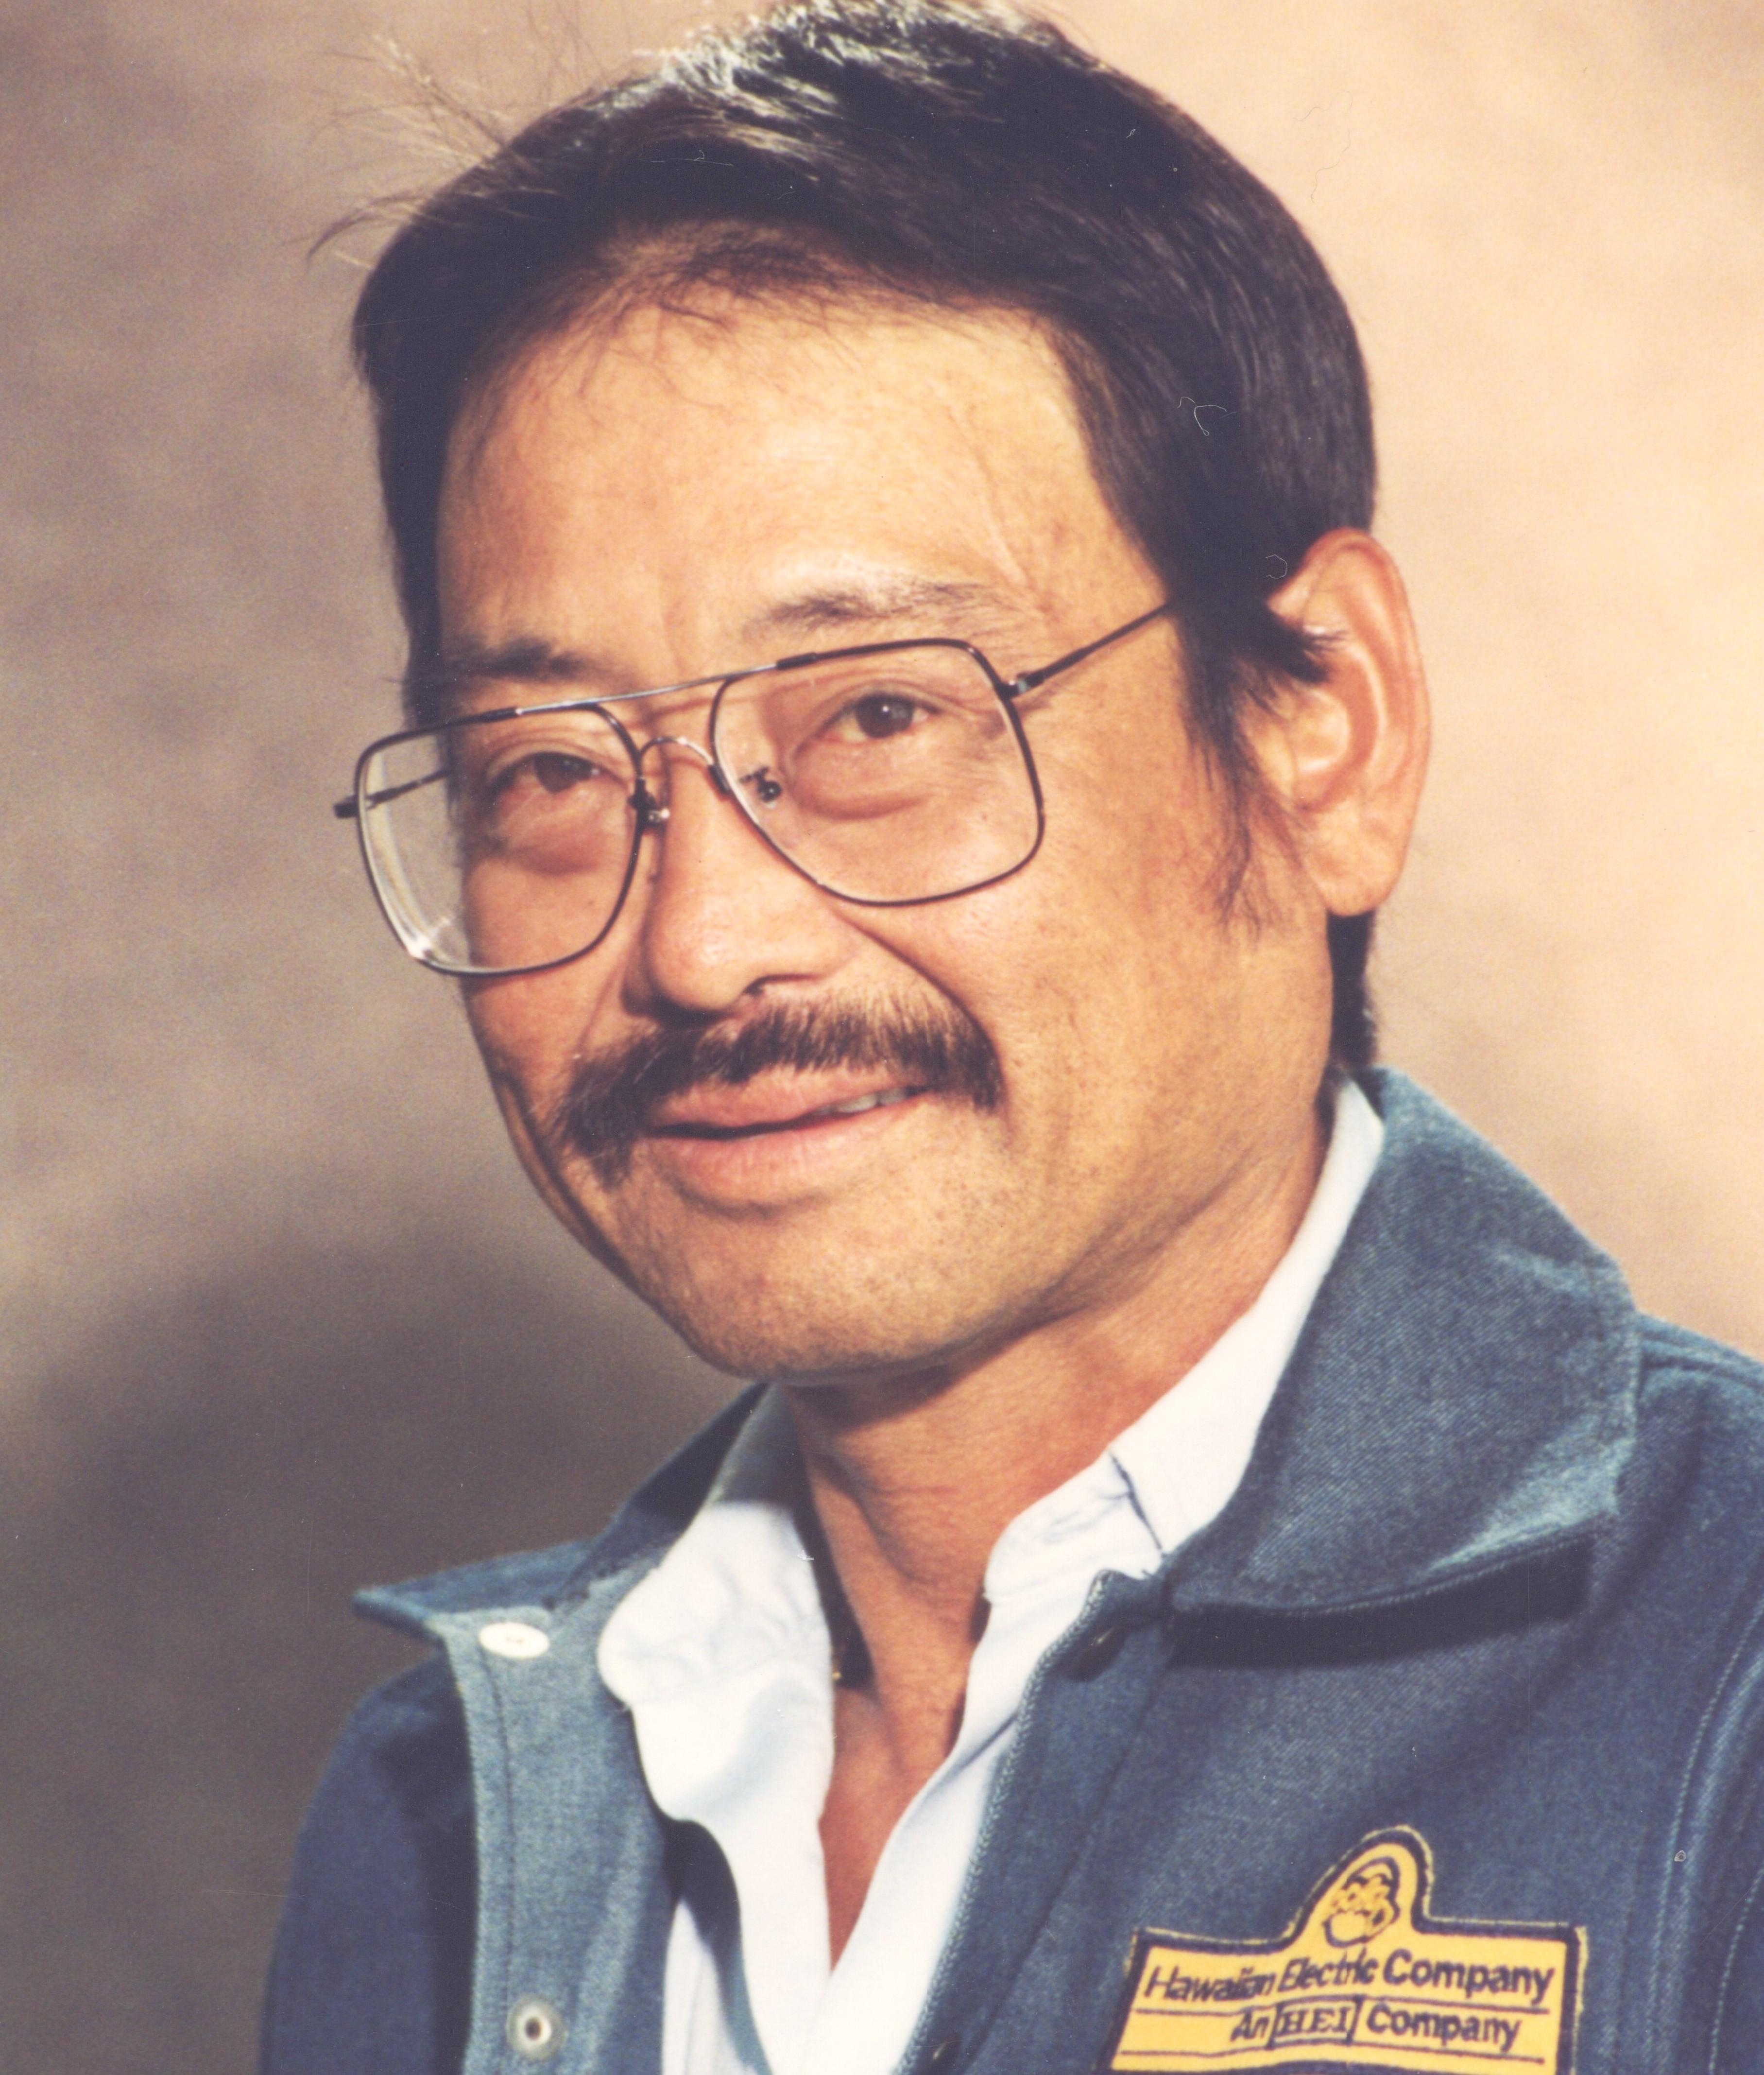 Chad Yasuo Oshiro